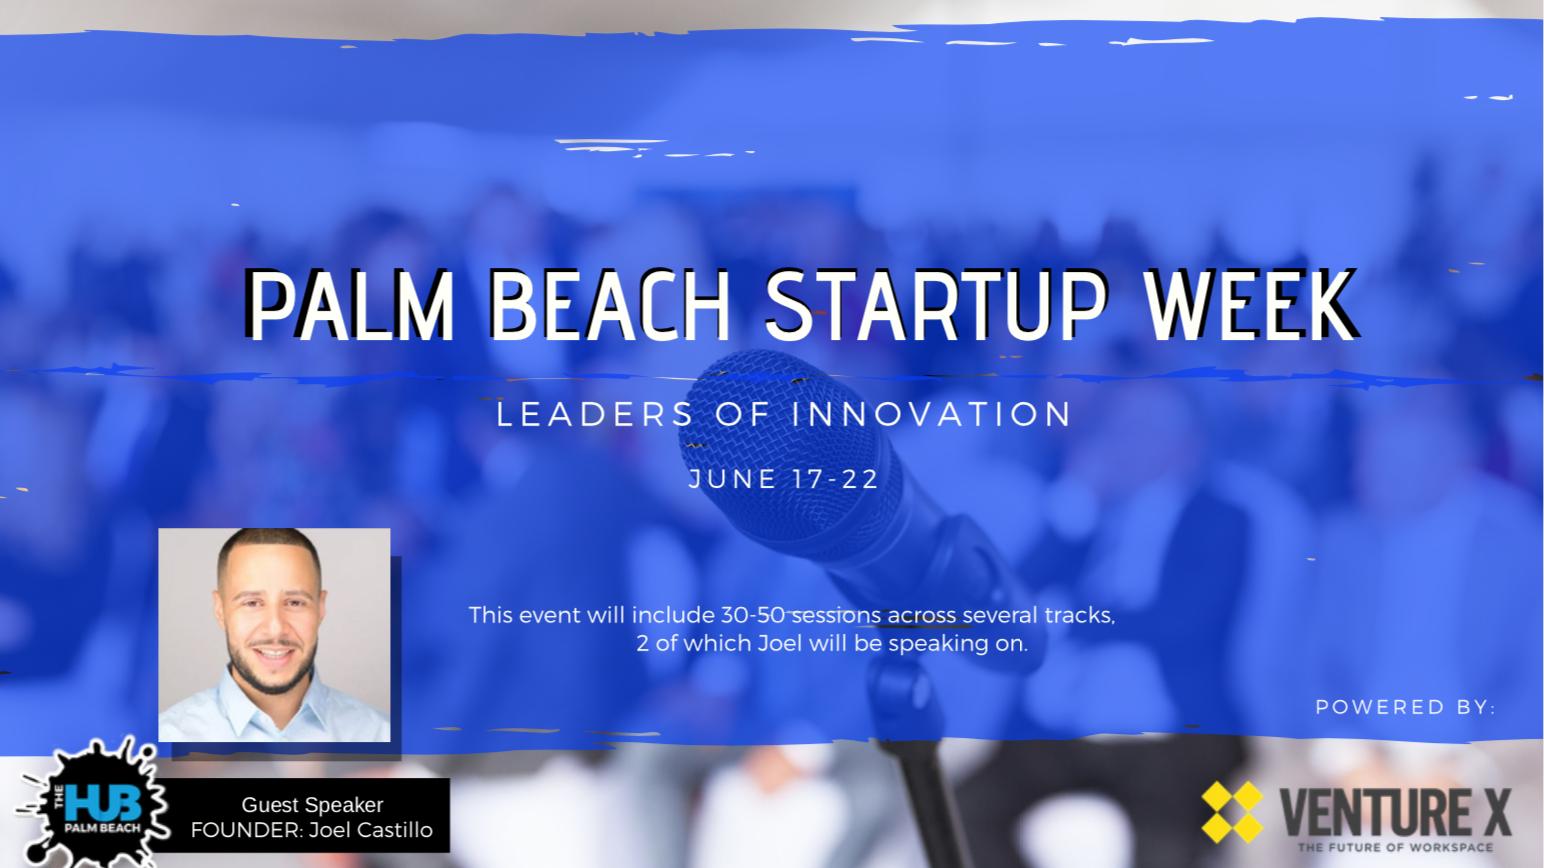 PALM BEACH STARTUP WEEK: LEADERS OF INNOVATION